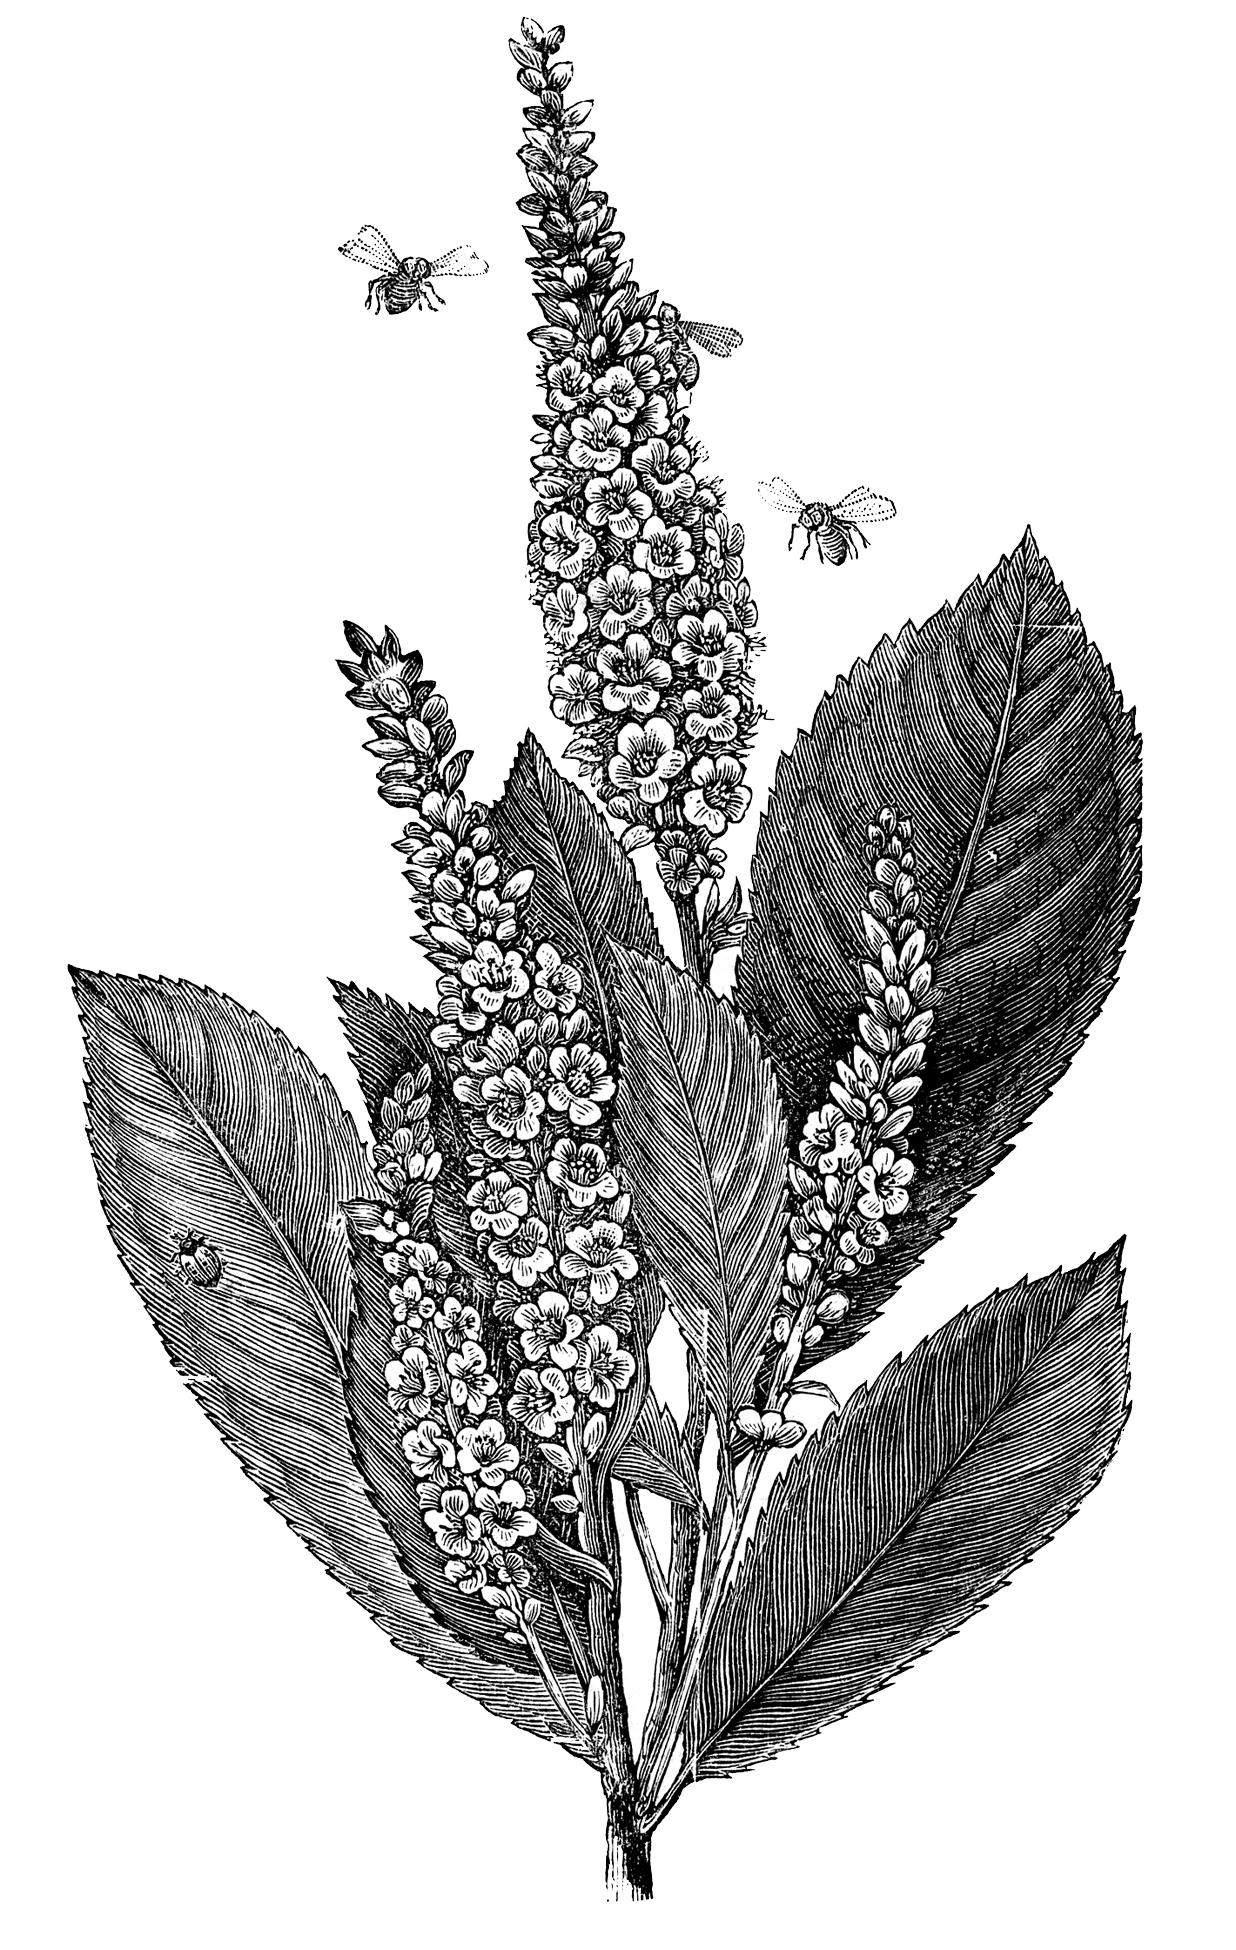 Vintage Garden Image Flowers Bees Ladybug The